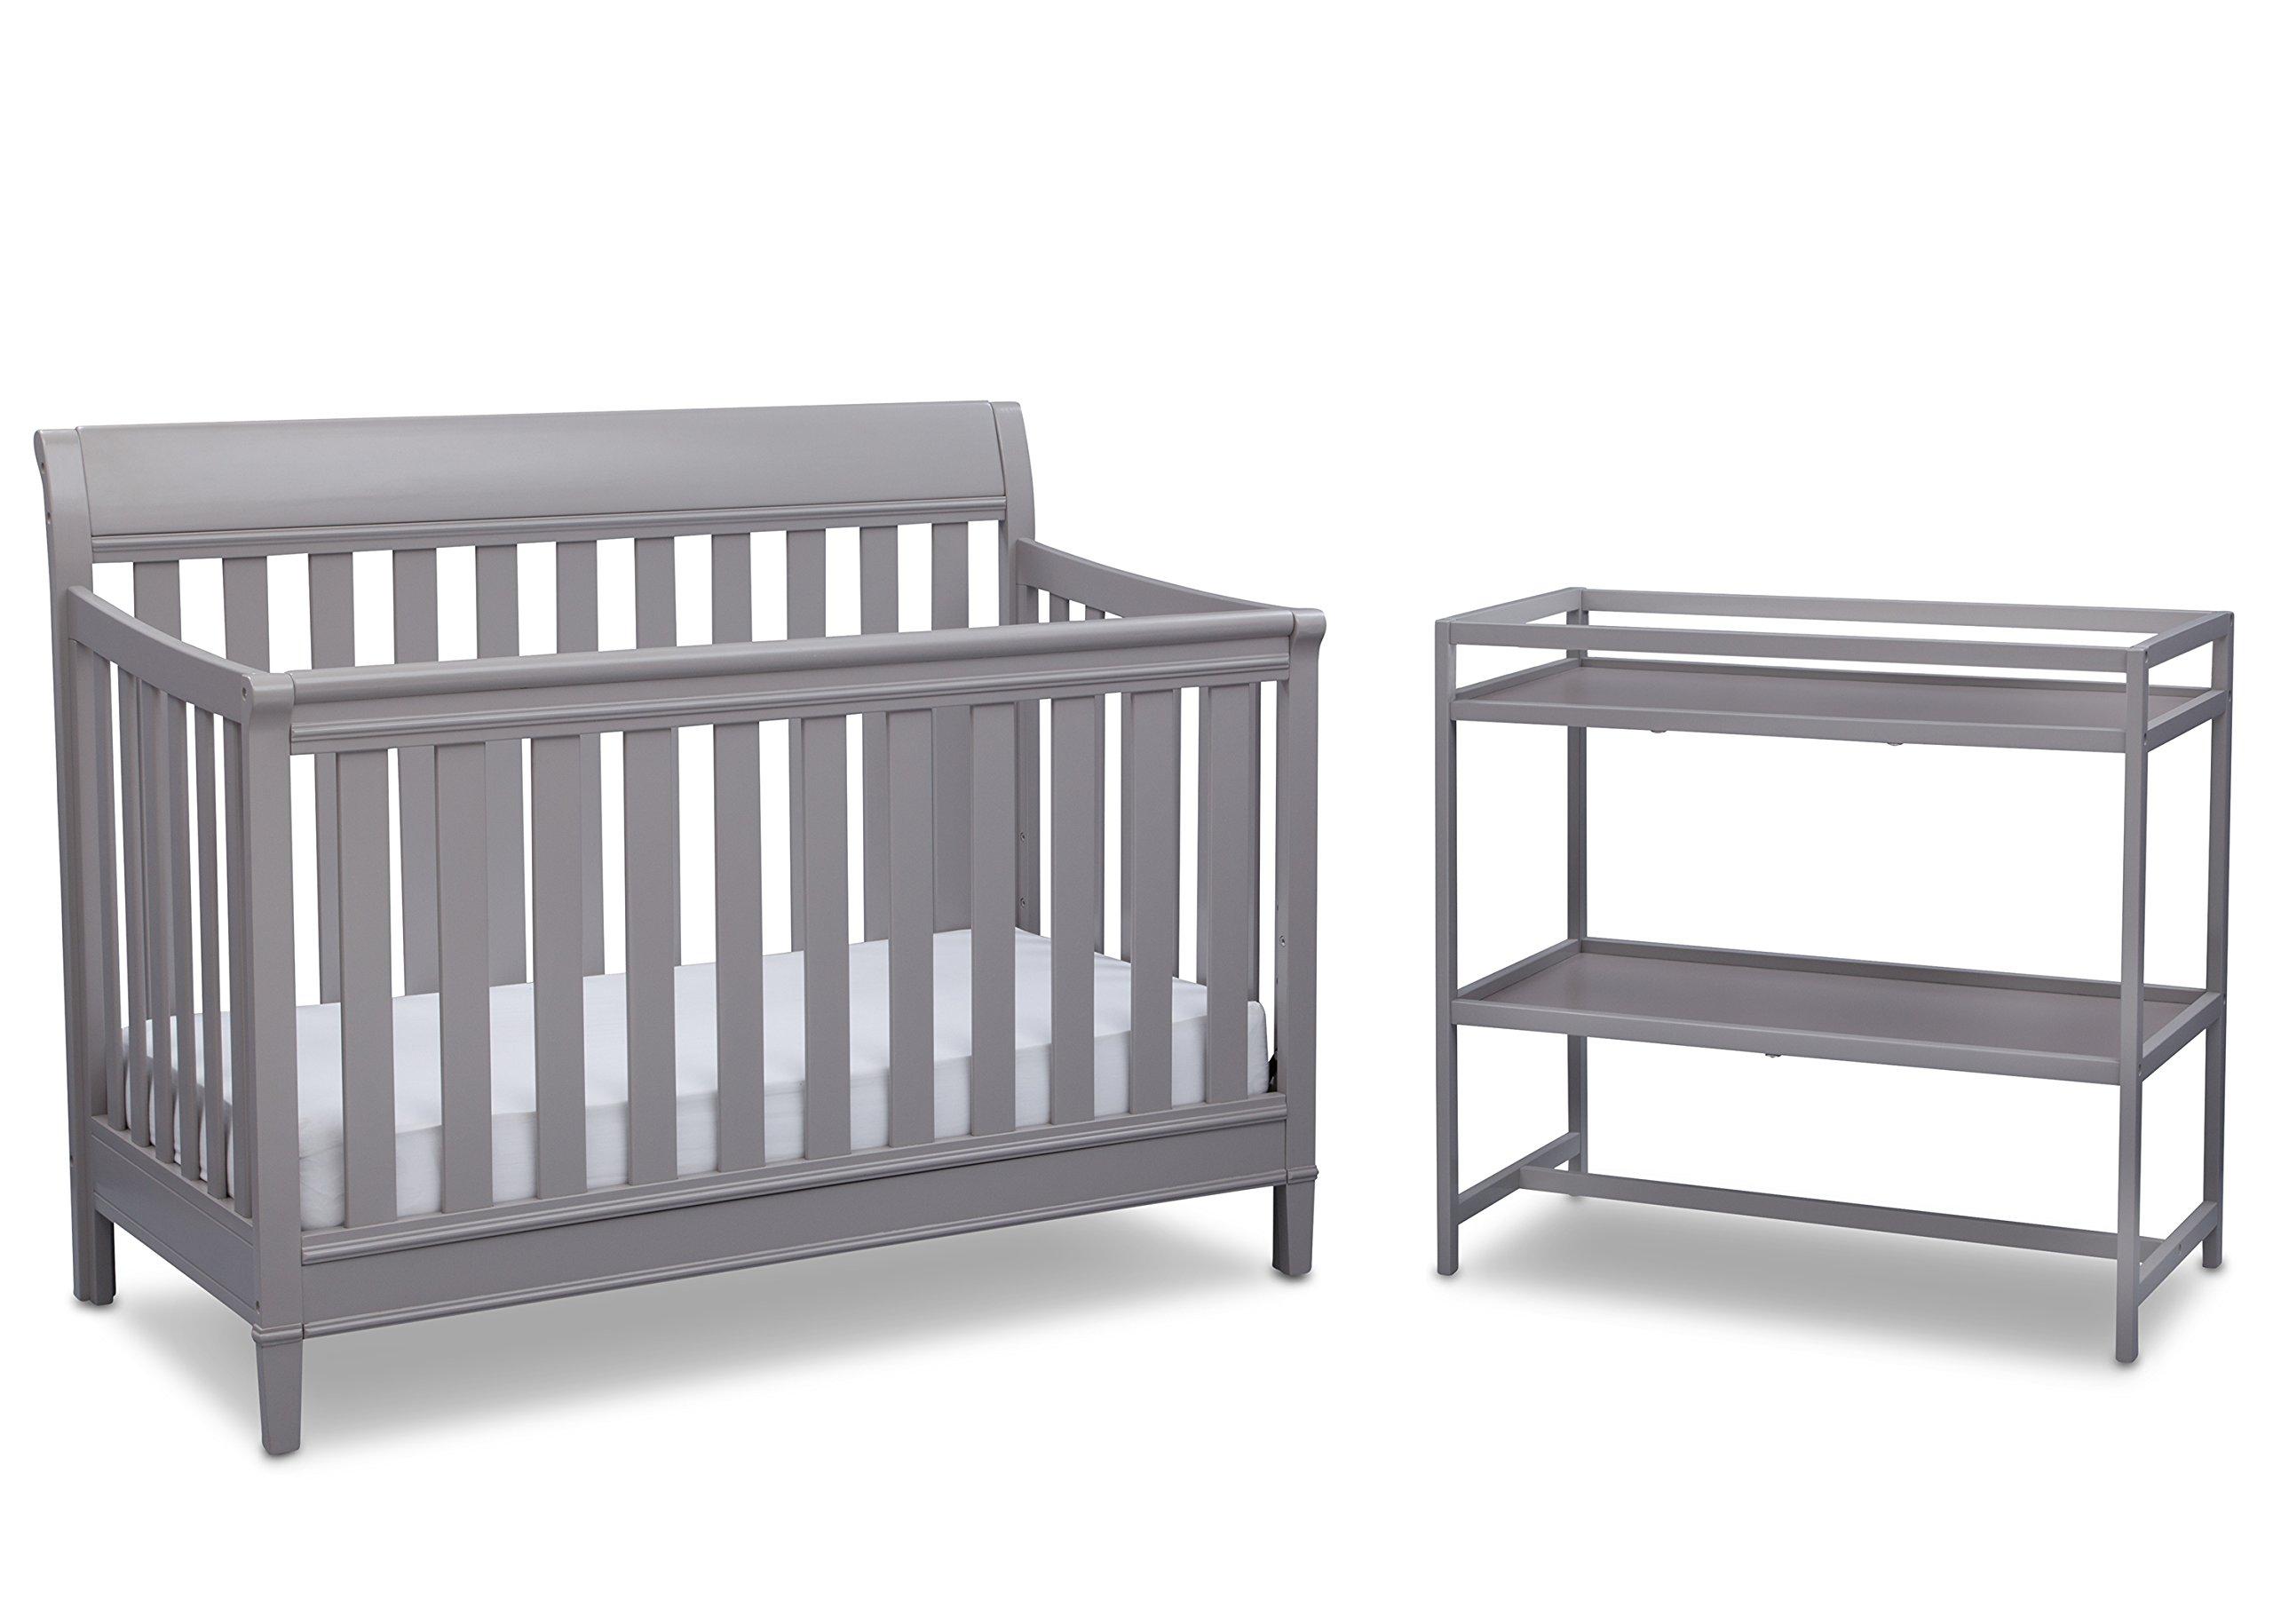 Delta Children Harbor 4-in-1 Convertible Crib with Bonus Changing Table, Grey